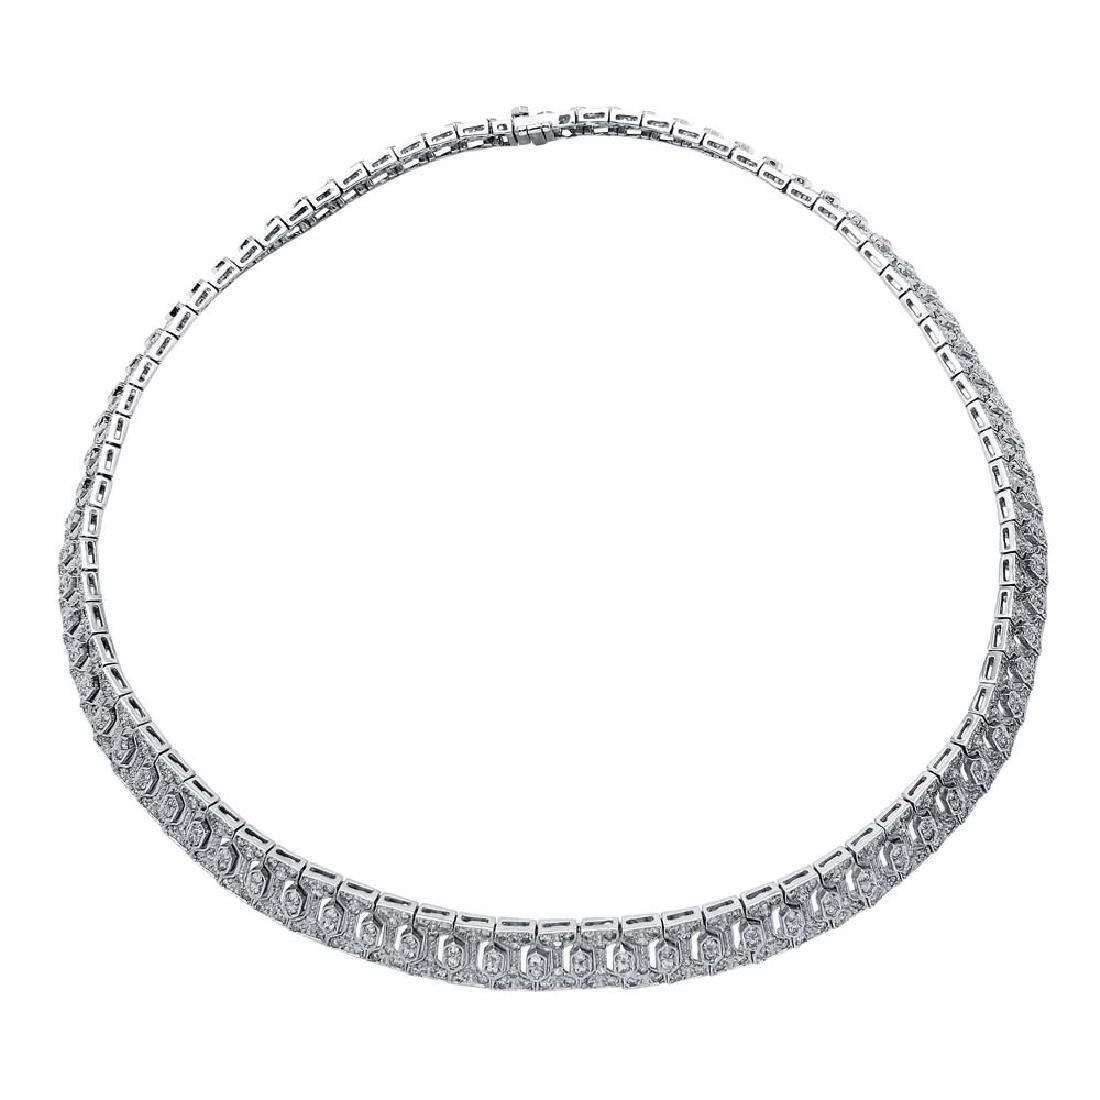 Genuine 7 TCW 14K White Gold Ladies Necklace